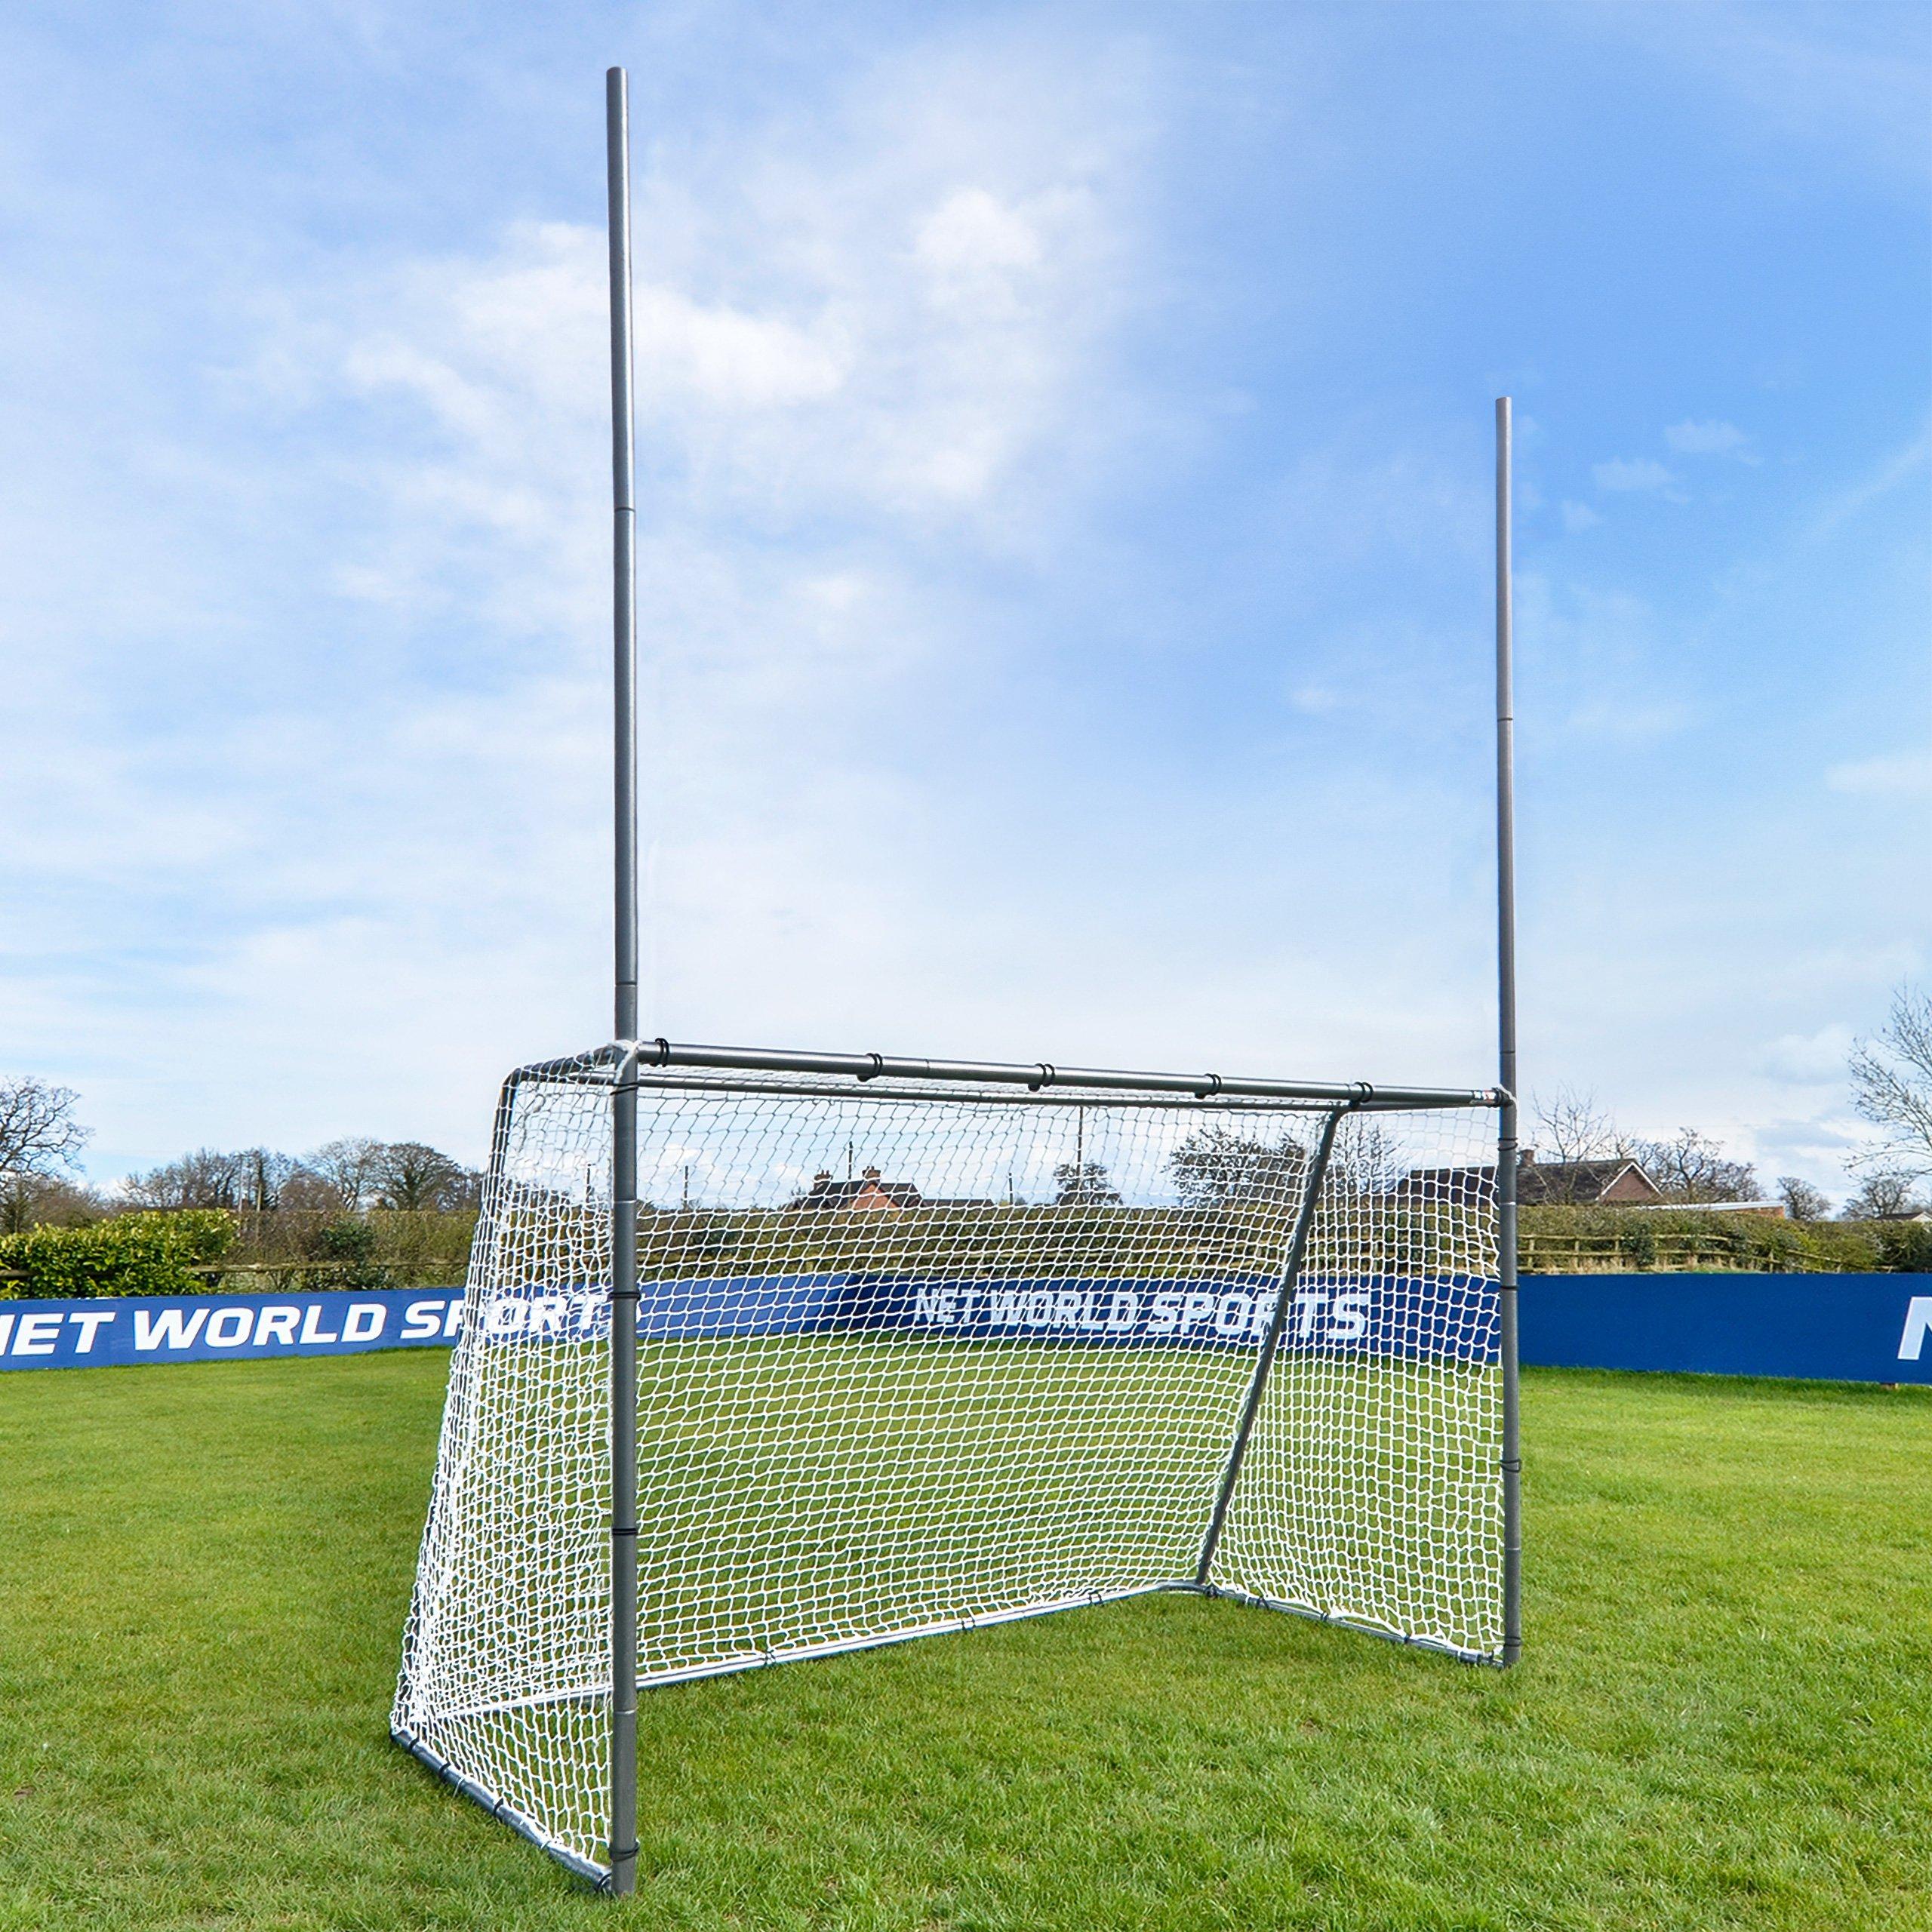 Net World Sports Forza Steel42 Football/Soccer Combination Goal Posts - Super Strong Steel Goals for The Backyard (8ft x 5ft)